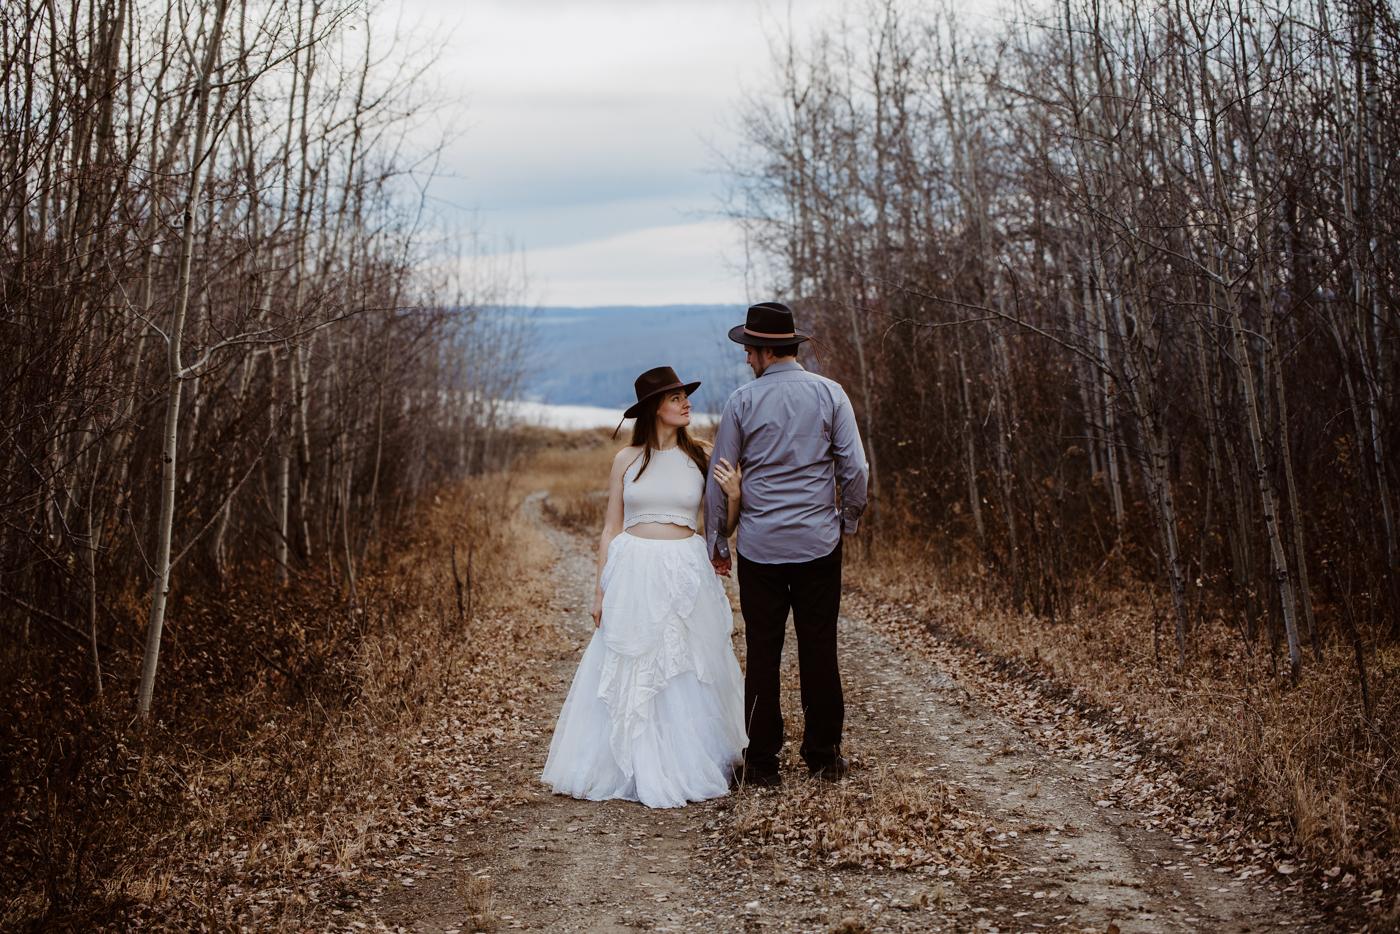 FortSt.John_photographer_TyraEPhotography_Wedding_Couple_Family_Photograhy_DawsonCreek_Elopement_Bride_Boduoir_Portraits-28.jpg